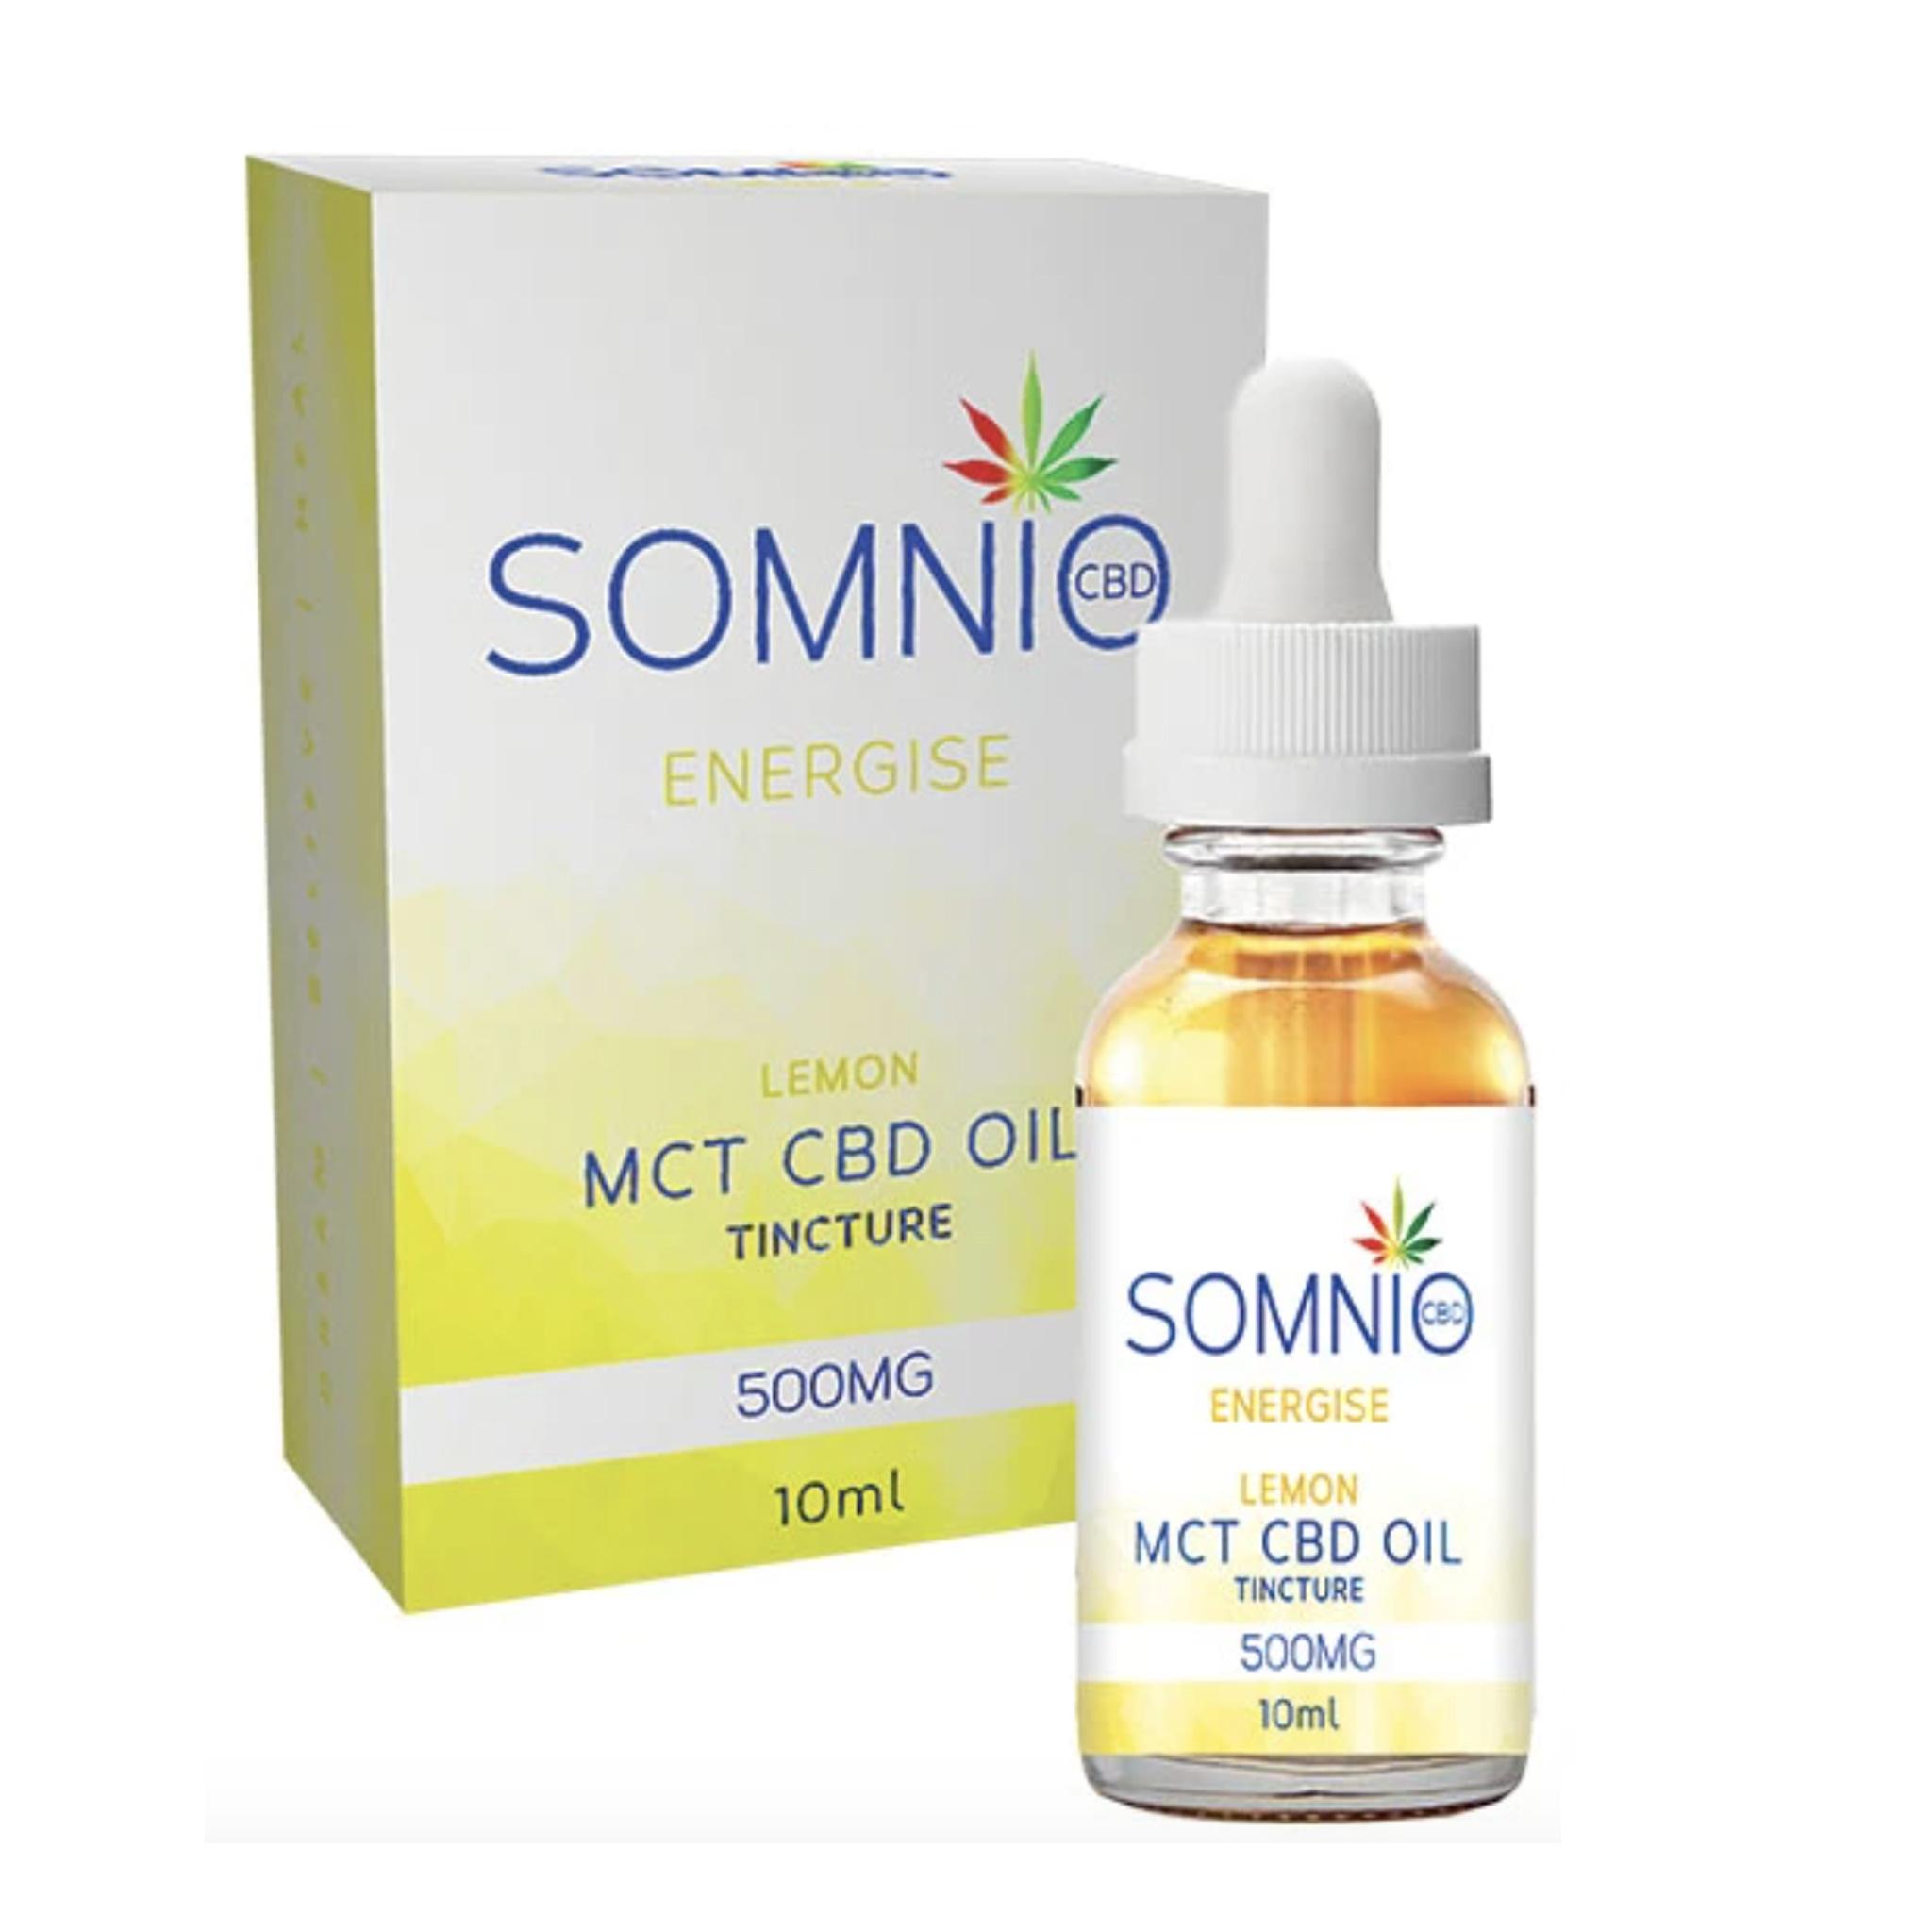 Somnio Energise MCT CBD Oil Tincture: Lemon - 10ml